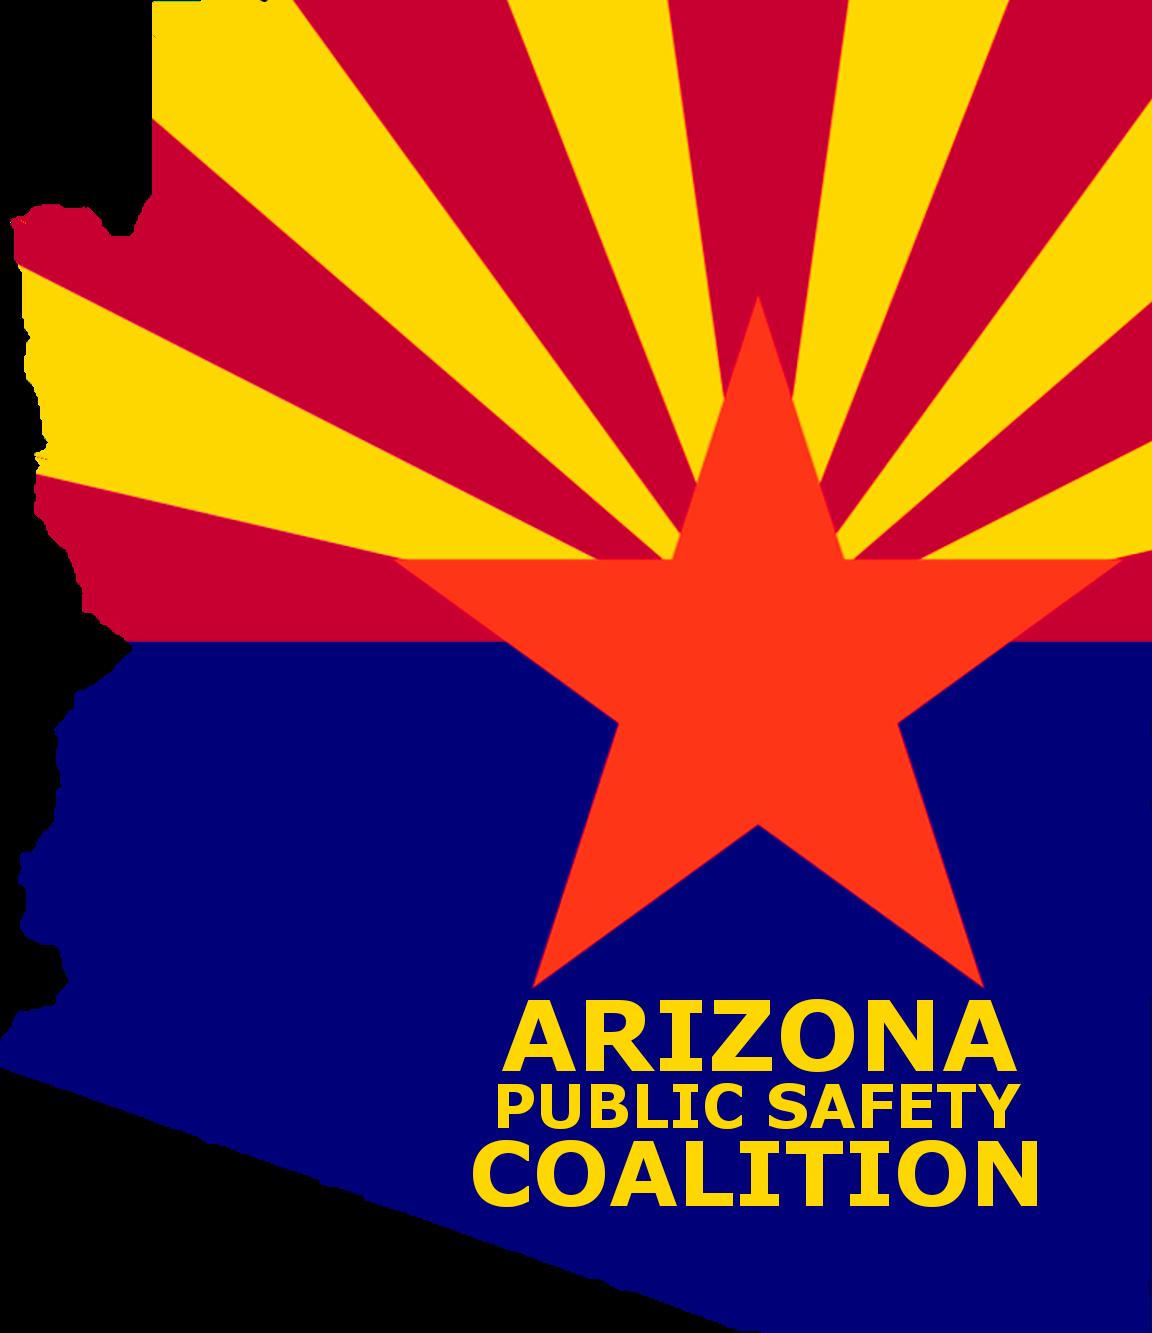 Handcuffs clipart tether. Arizona public safety coalition